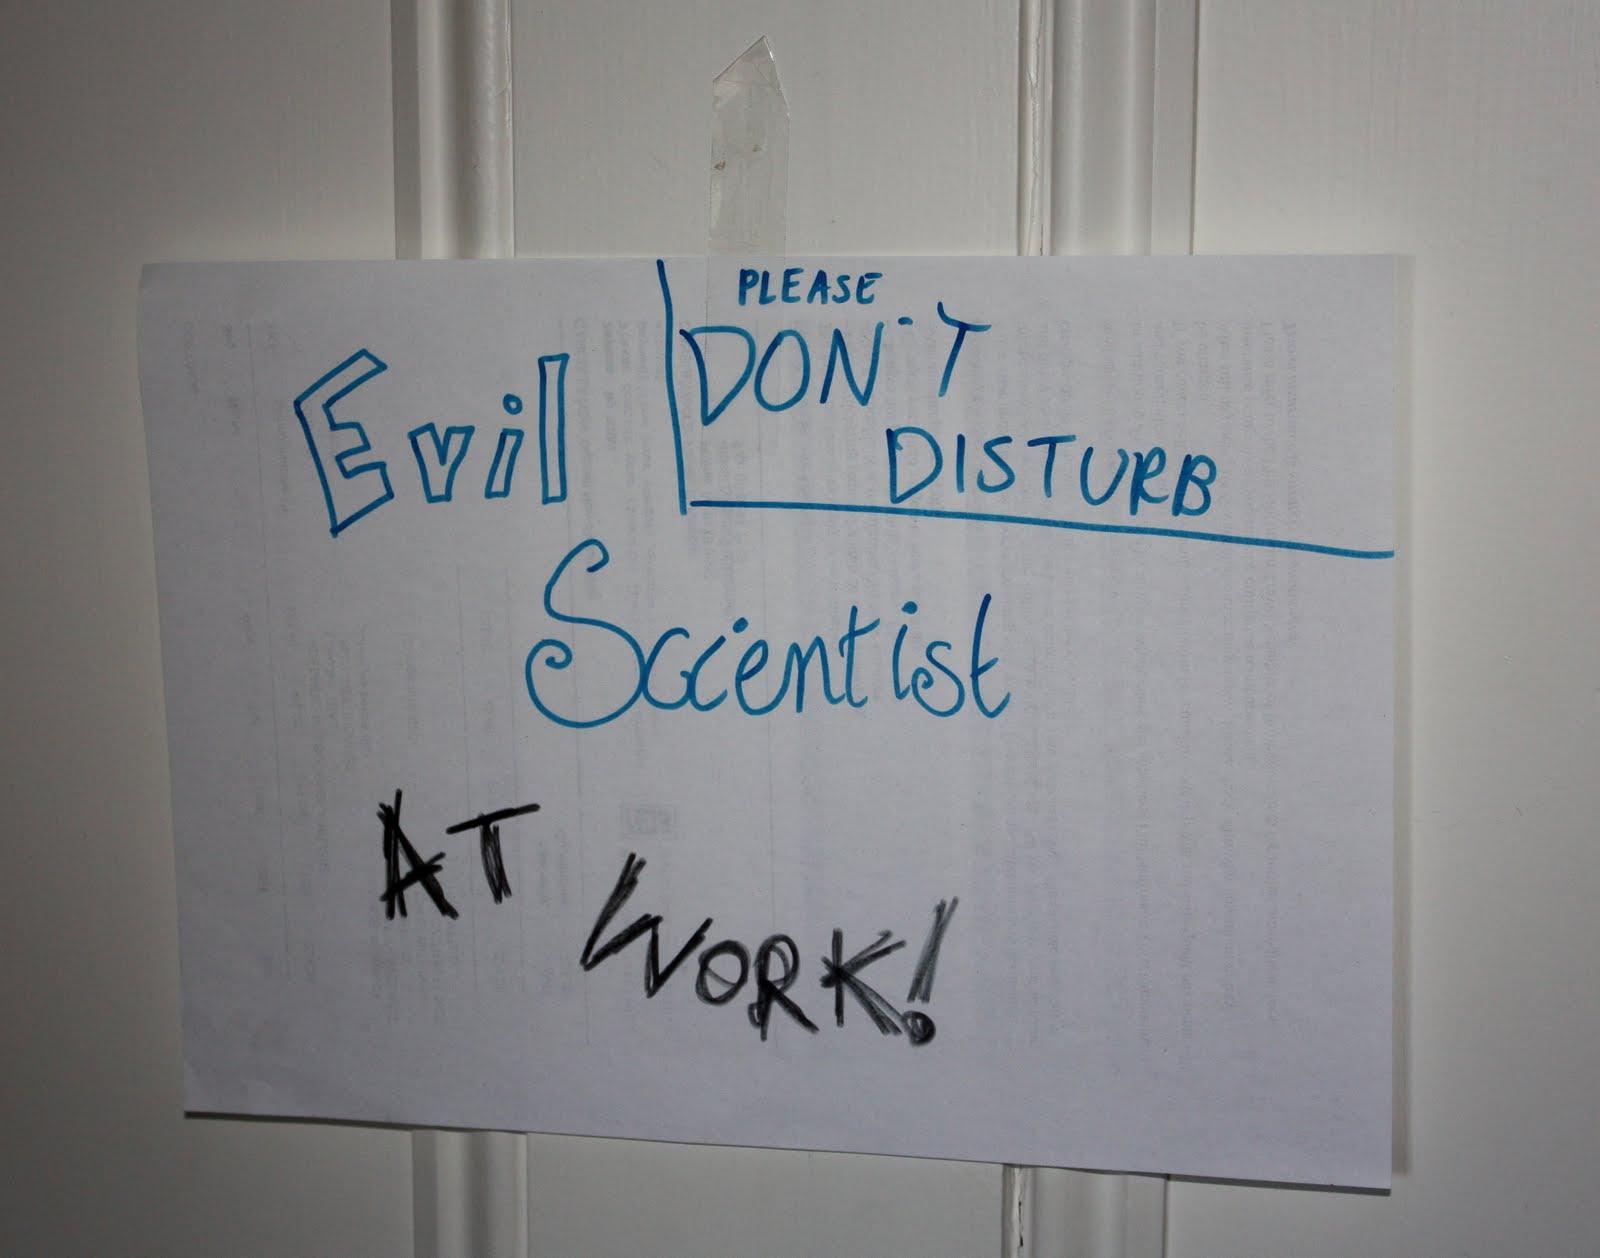 http://1.bp.blogspot.com/_d_qMo4ImpiY/S-e50a5WxsI/AAAAAAAADsE/V9mVcFHNW3o/s1600/Evil+scientist+080310.jpg